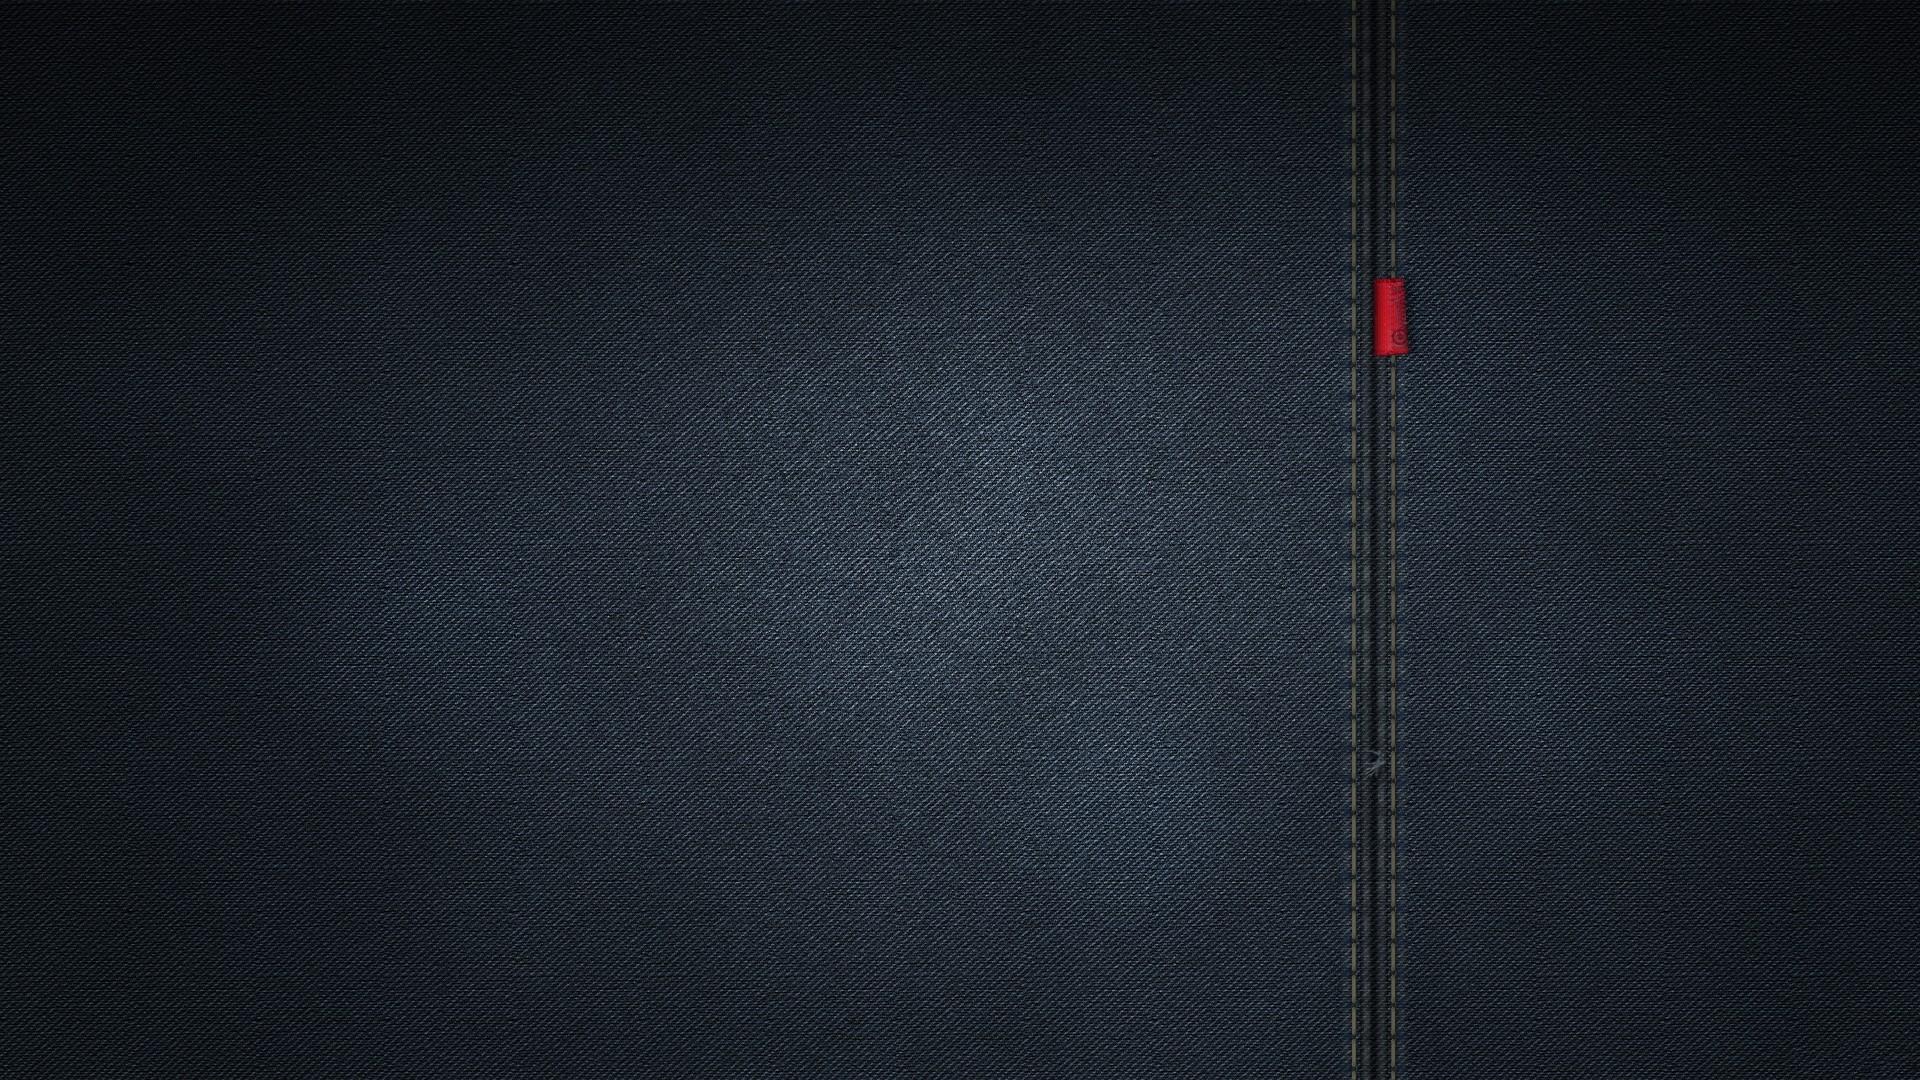 Blue Jeans Minimalistic Levis HD S Wallpaper